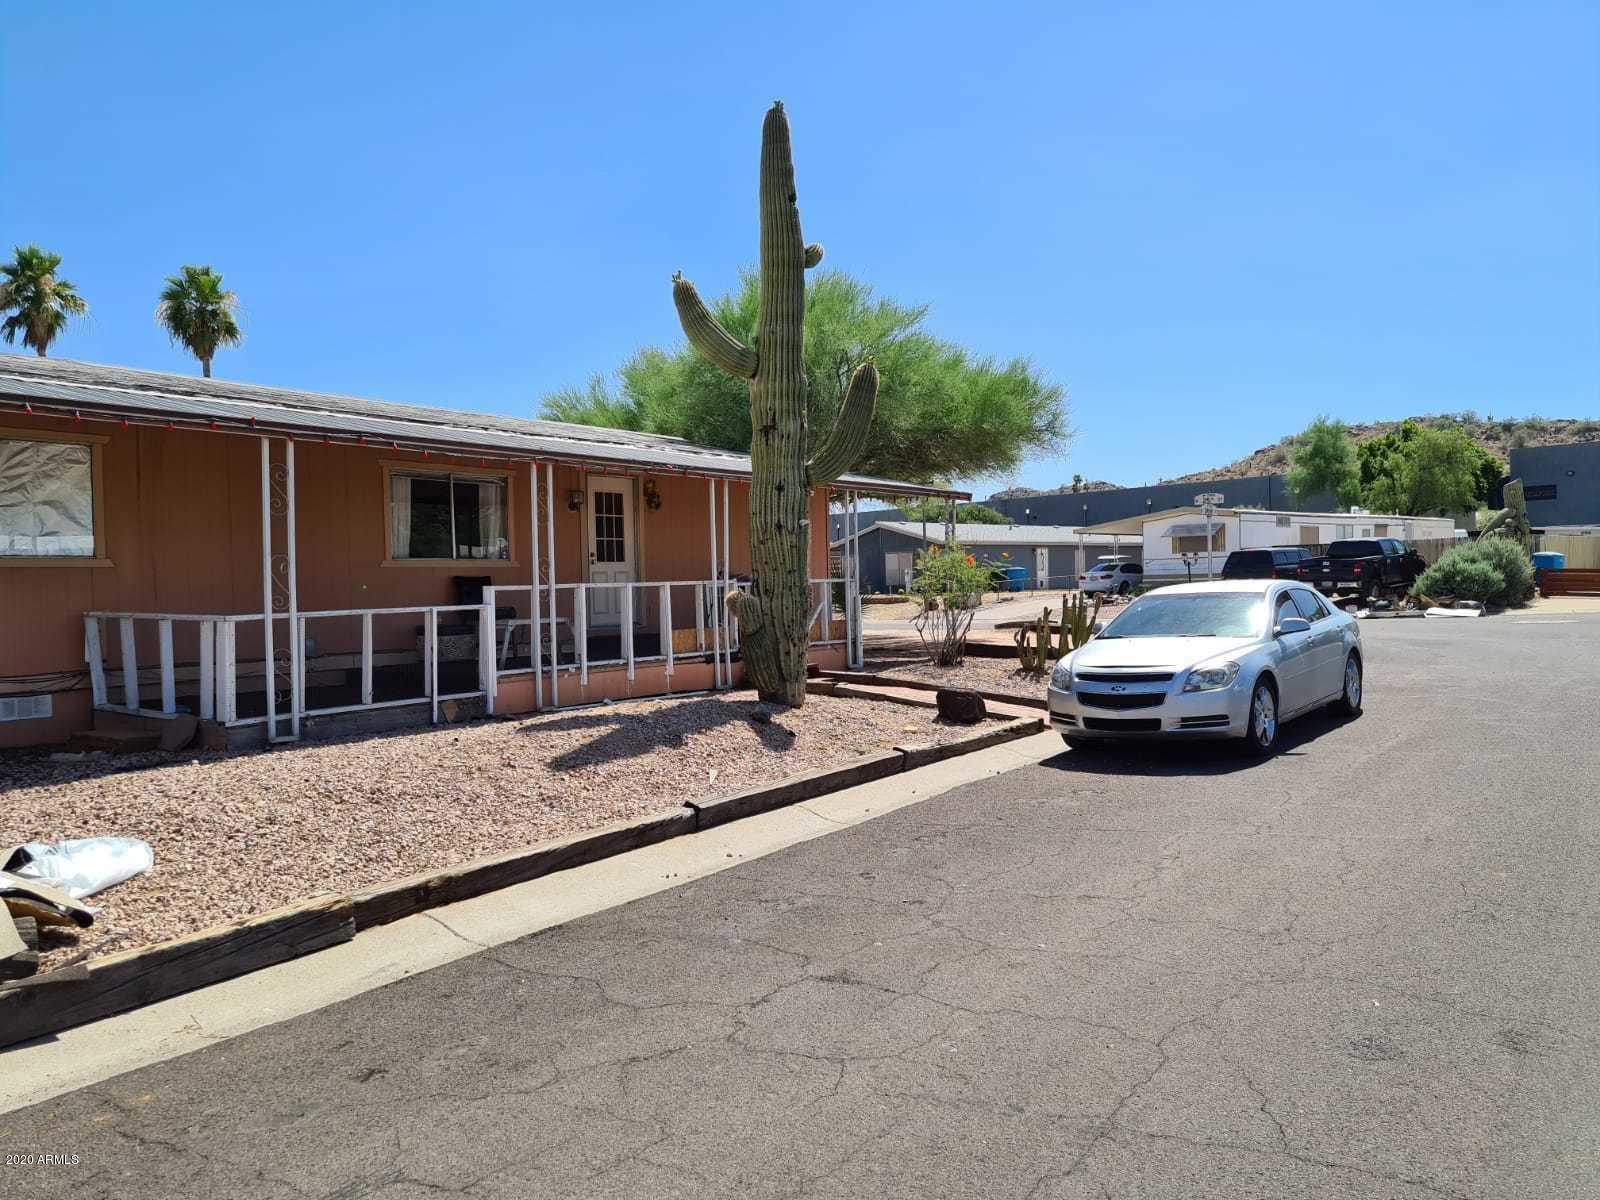 19429 N 25th Street, Phoenix, AZ 85050 - MLS#: 6089357